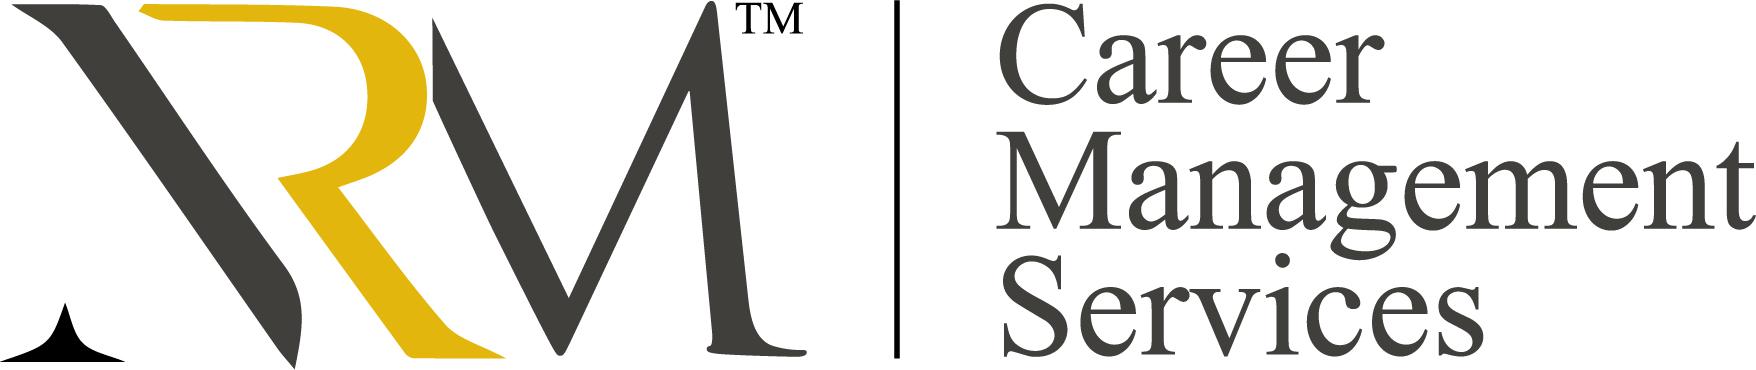 nrm logo horizontal